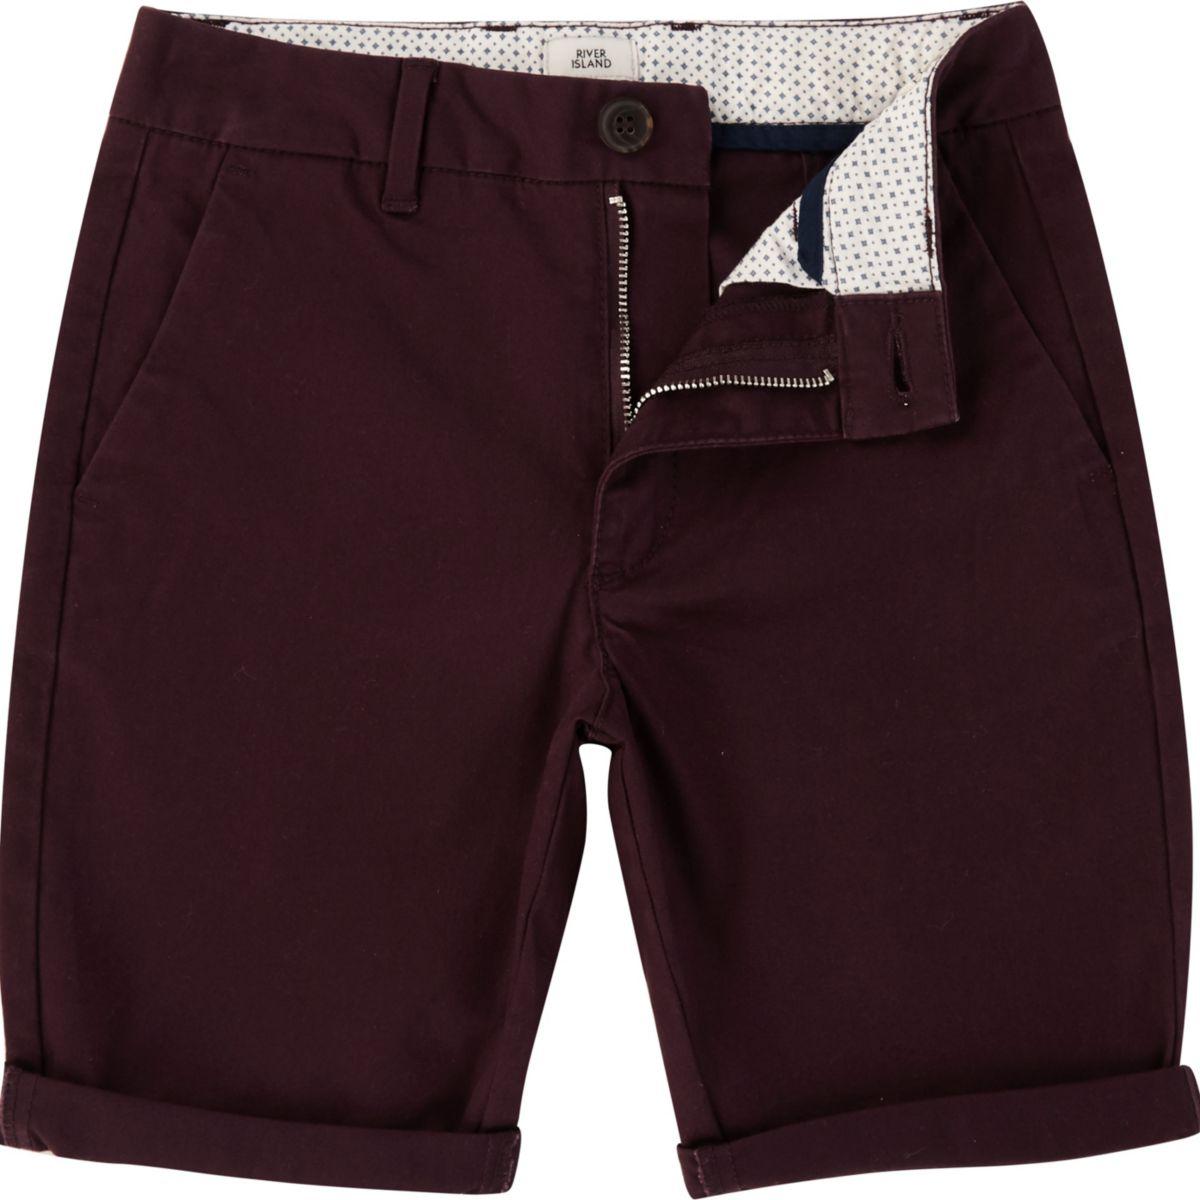 Boys purple chino shorts